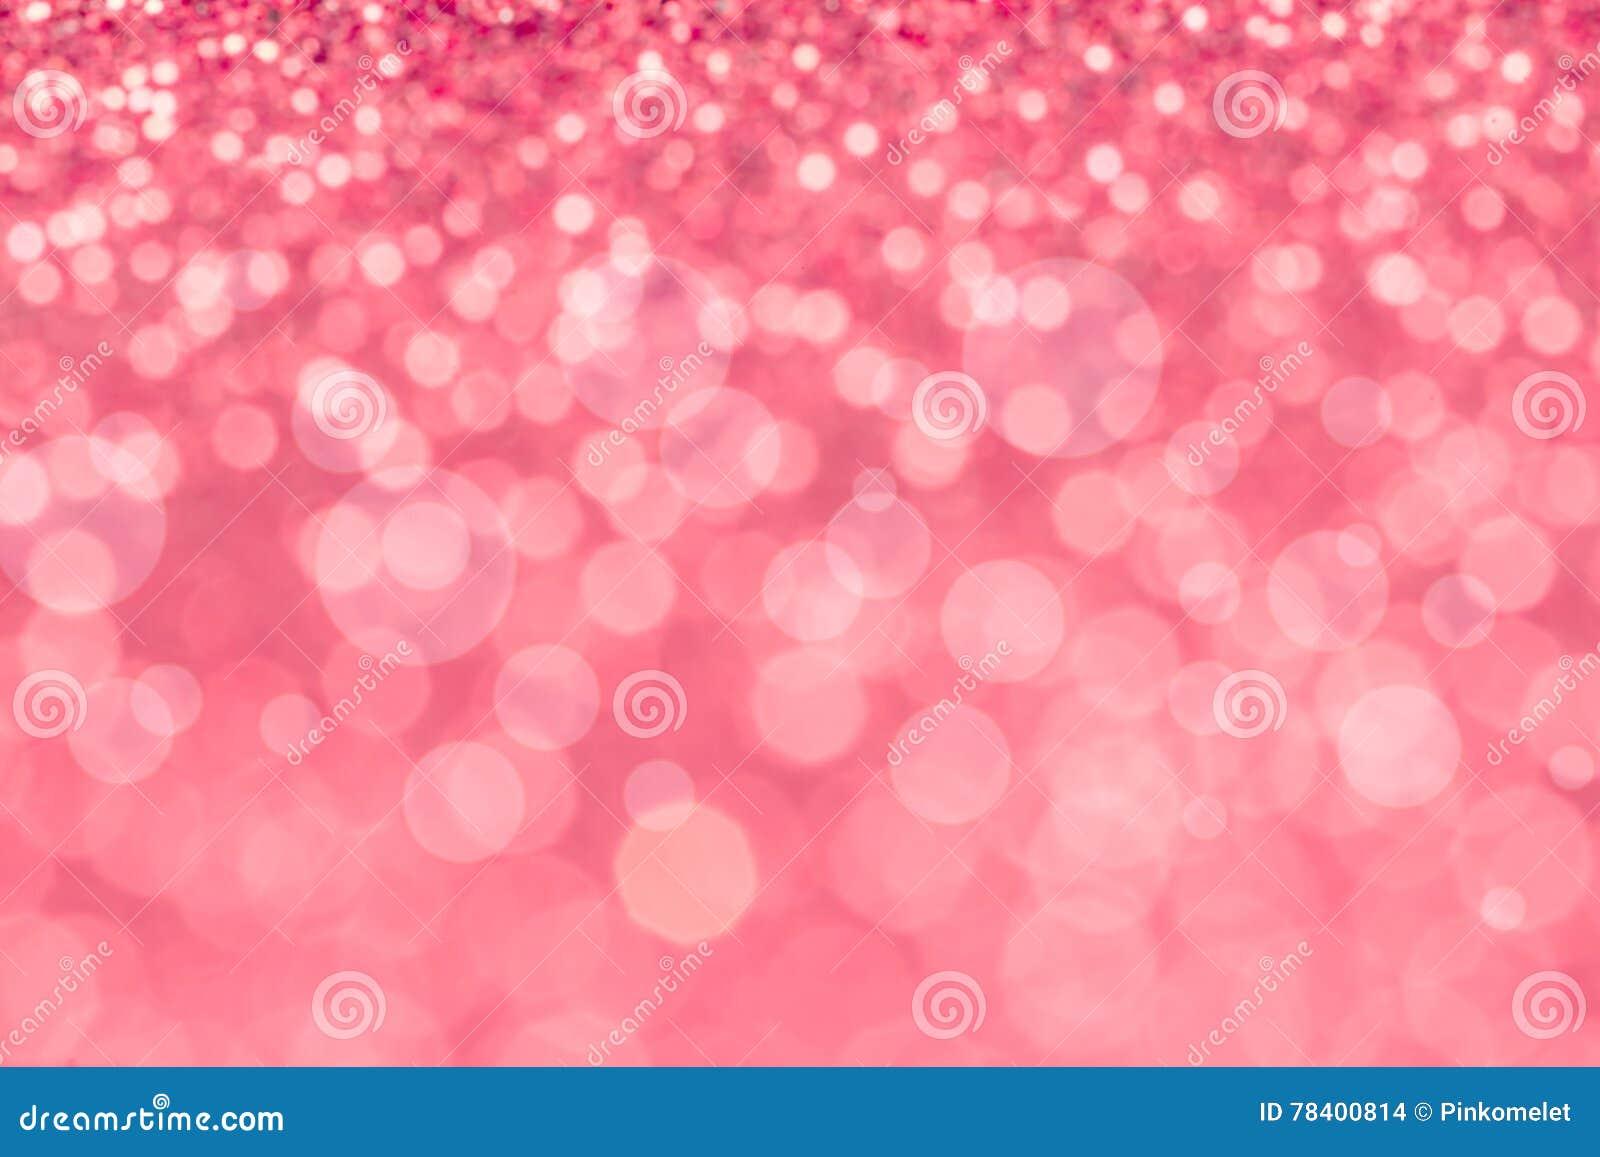 Abstract blur sweet pink bokeh lighting from glitter texture